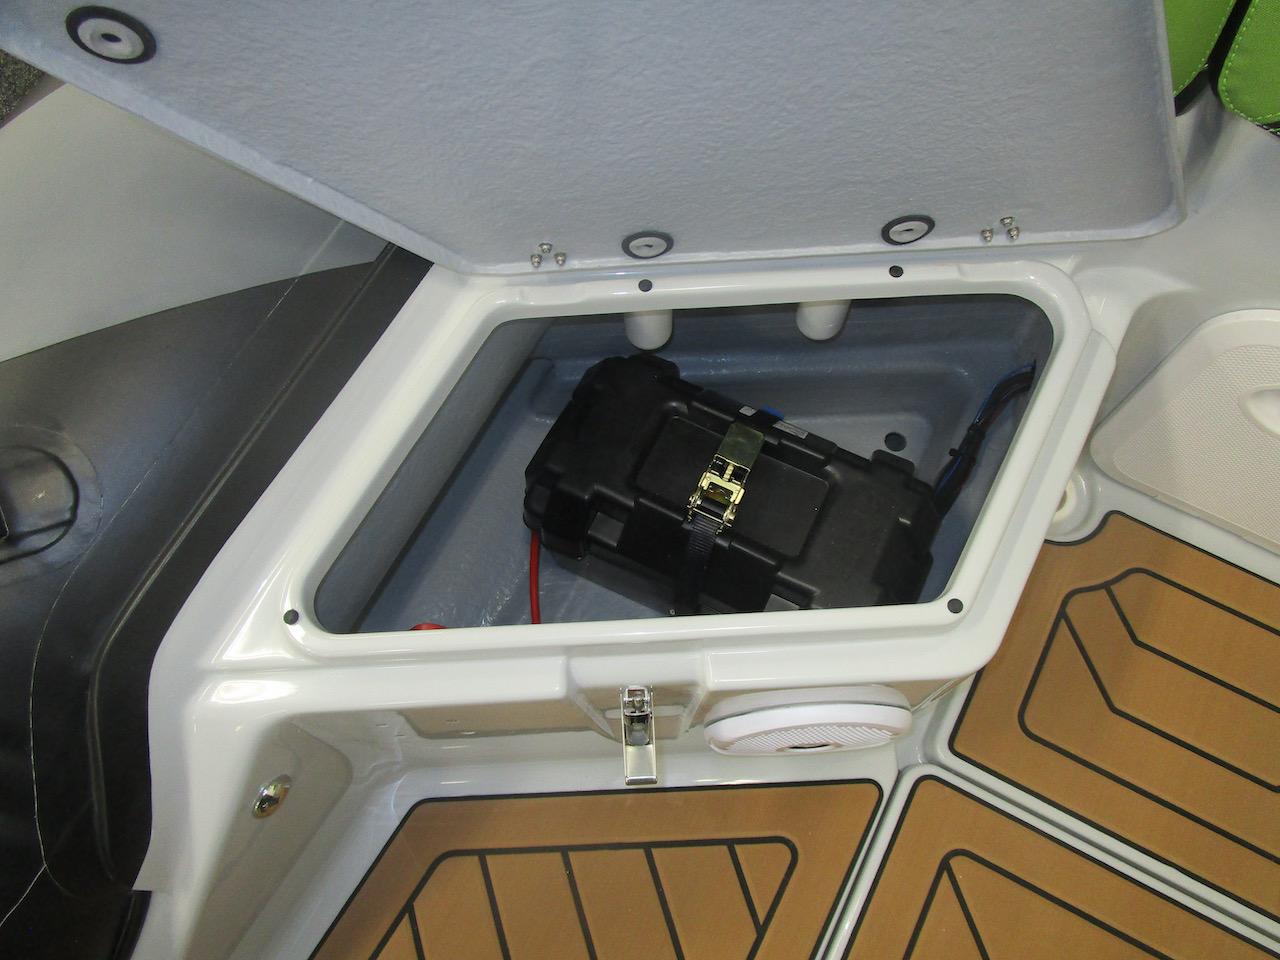 GRAND DRIVE D600 RIB battery locker